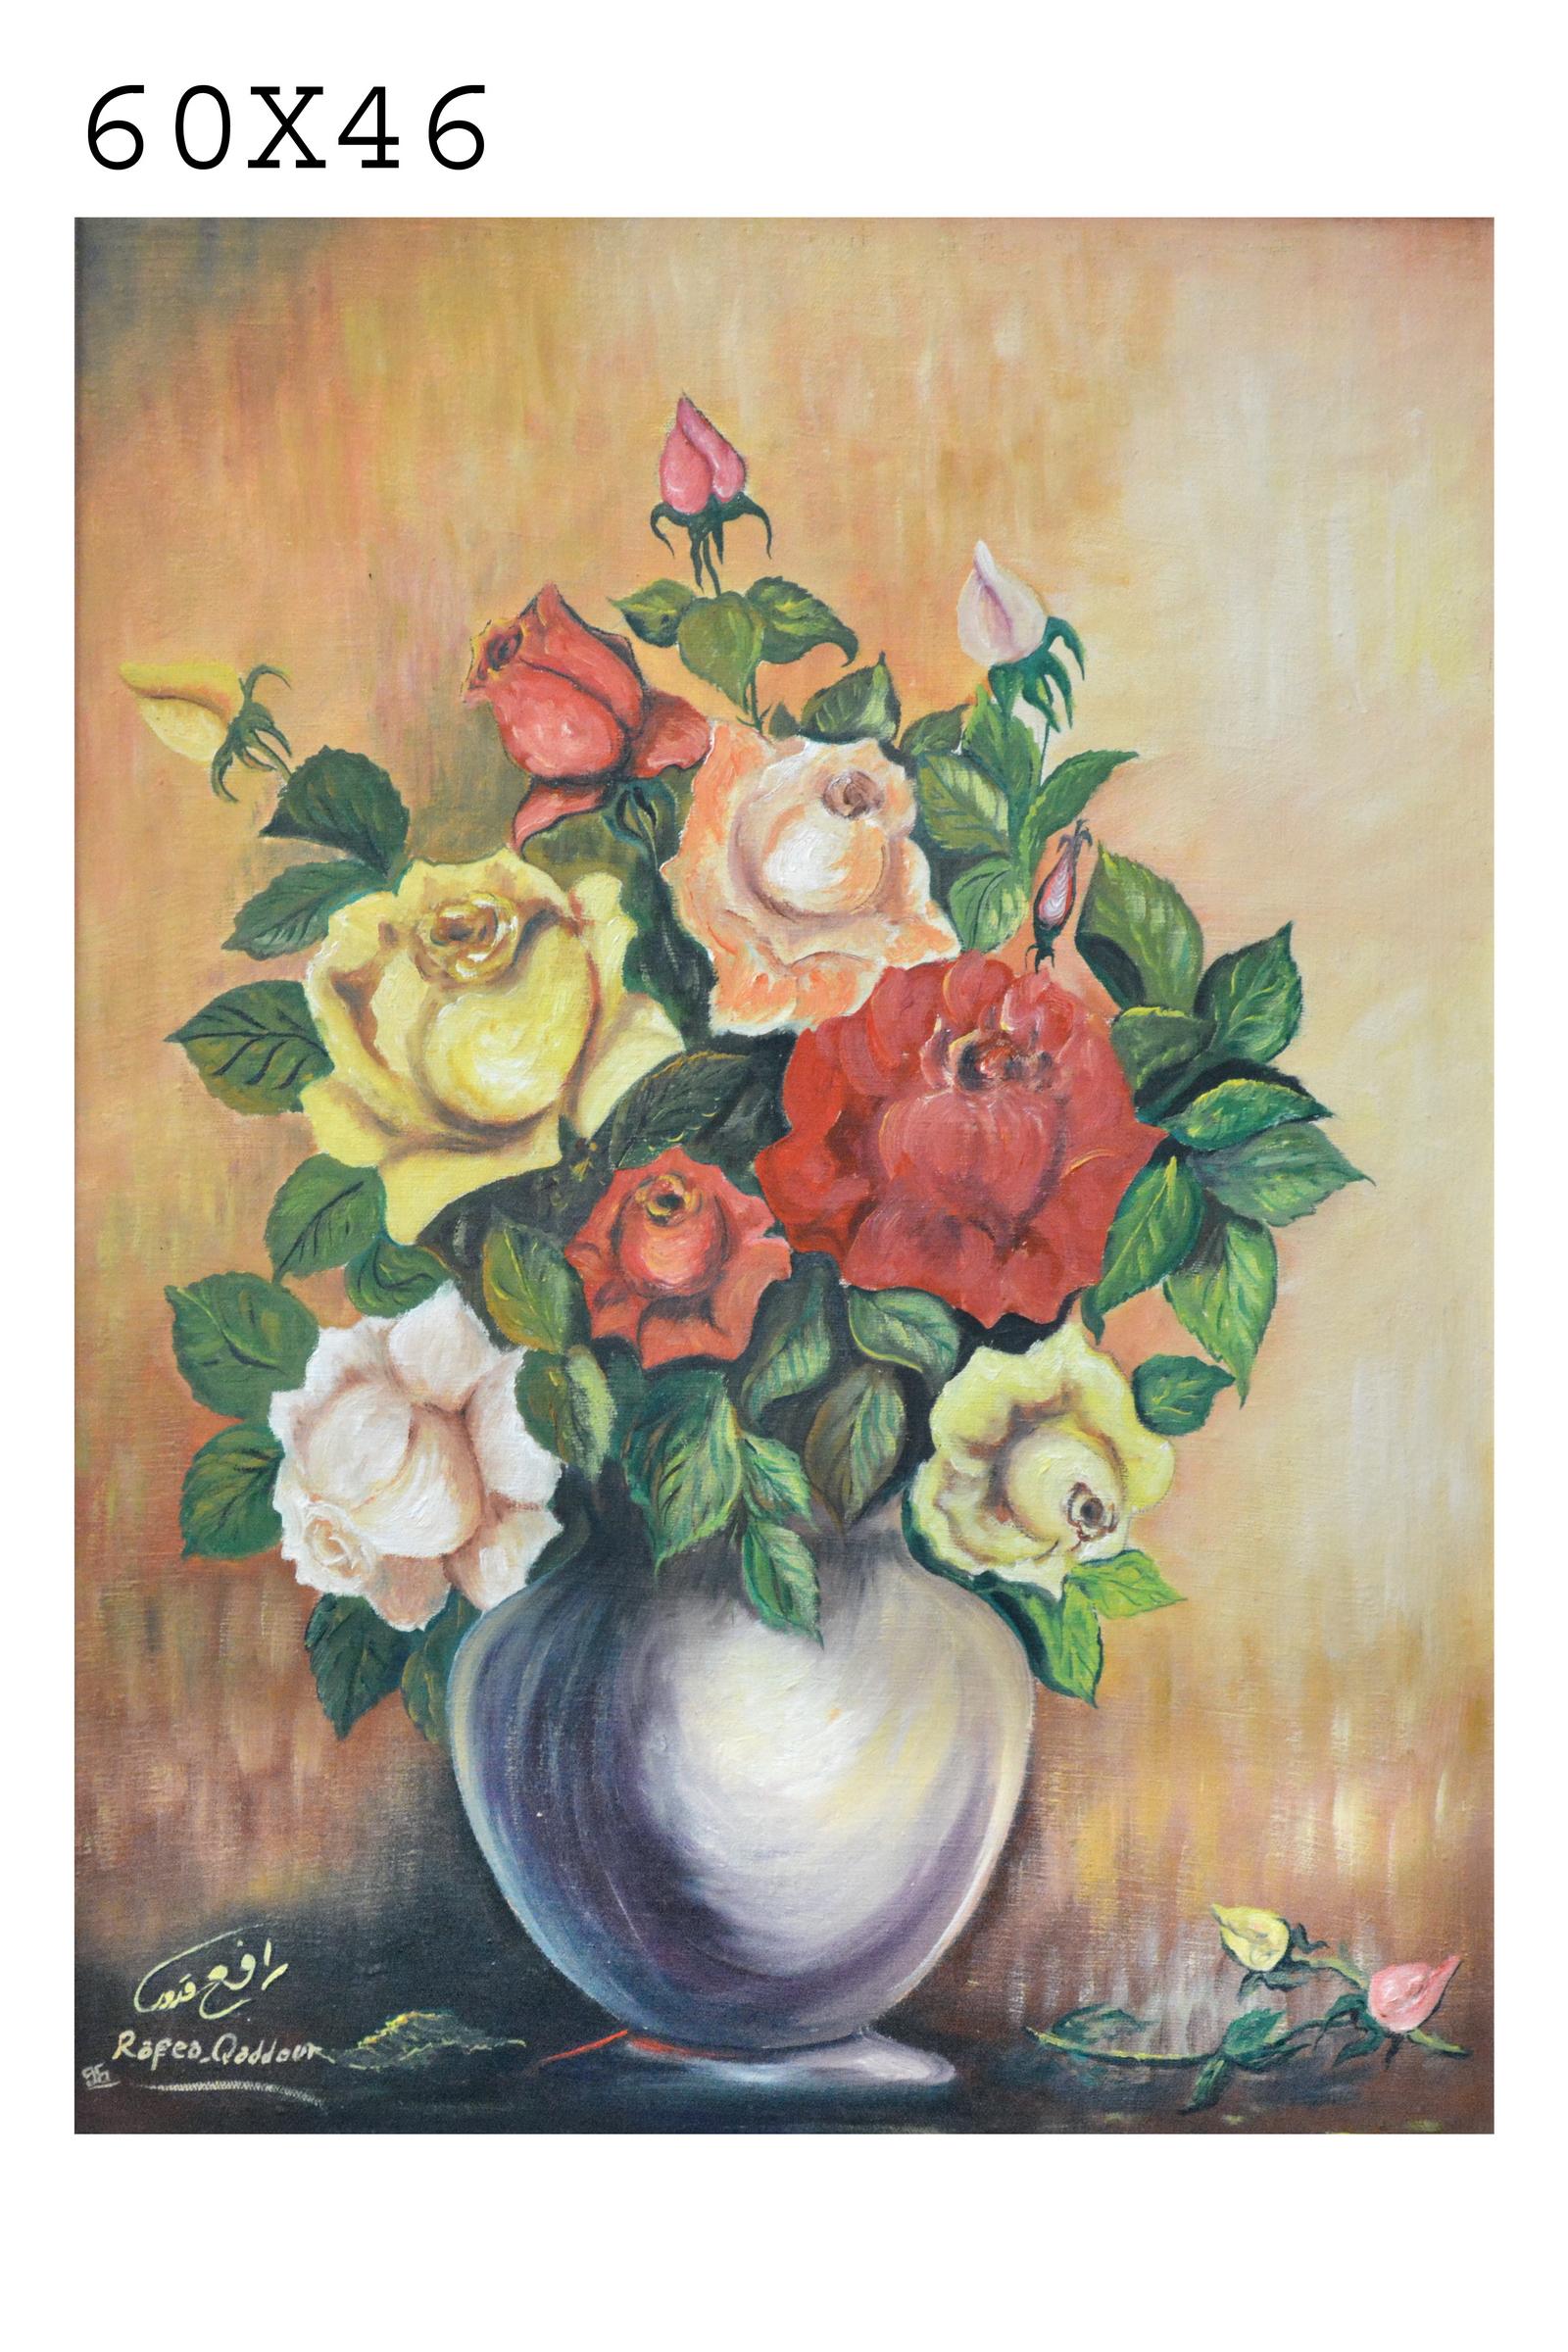 151_284 - Artist Rafe Qaddour  - 60 in 46 oil on canvas - رافع قدور.JPG